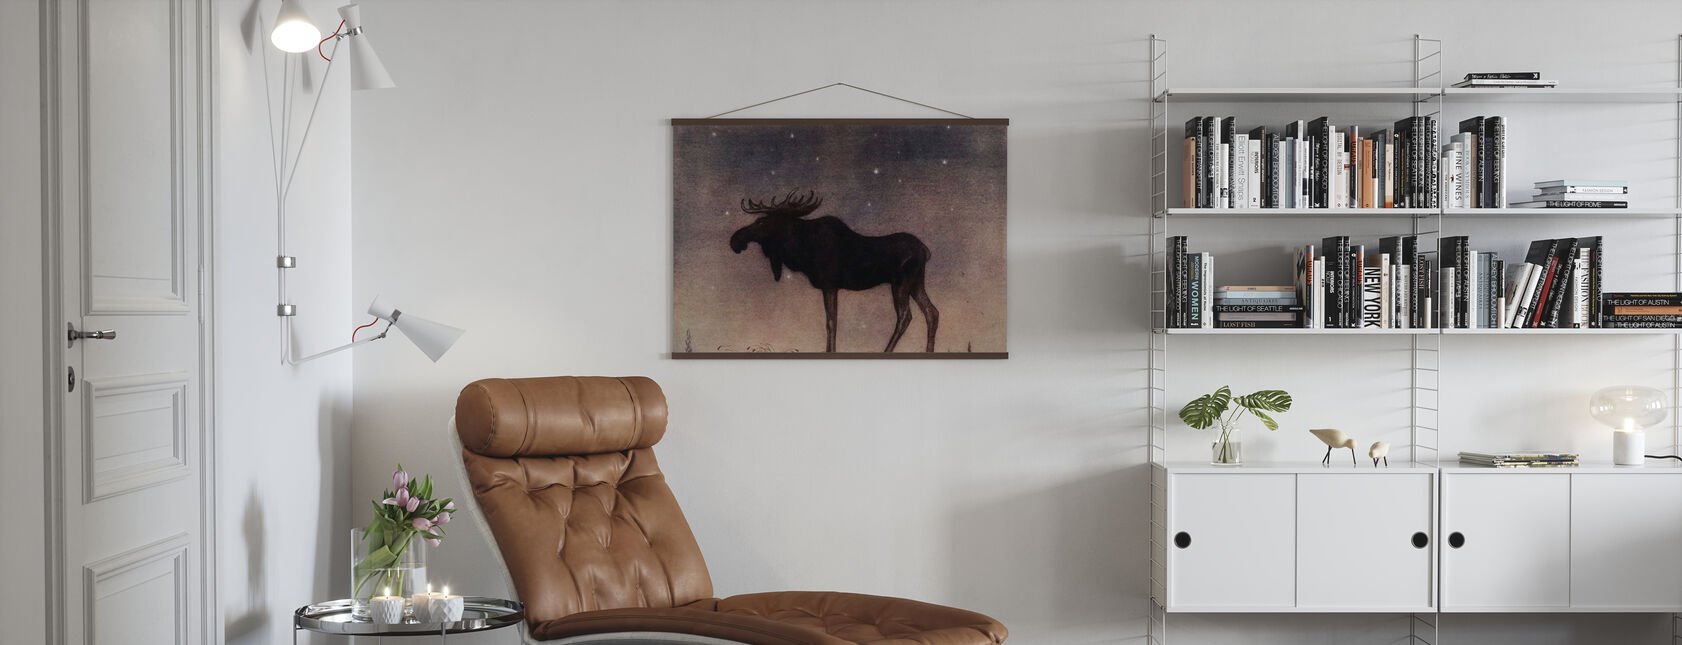 John Bauer - Älgtjuren - Poster - Living Room